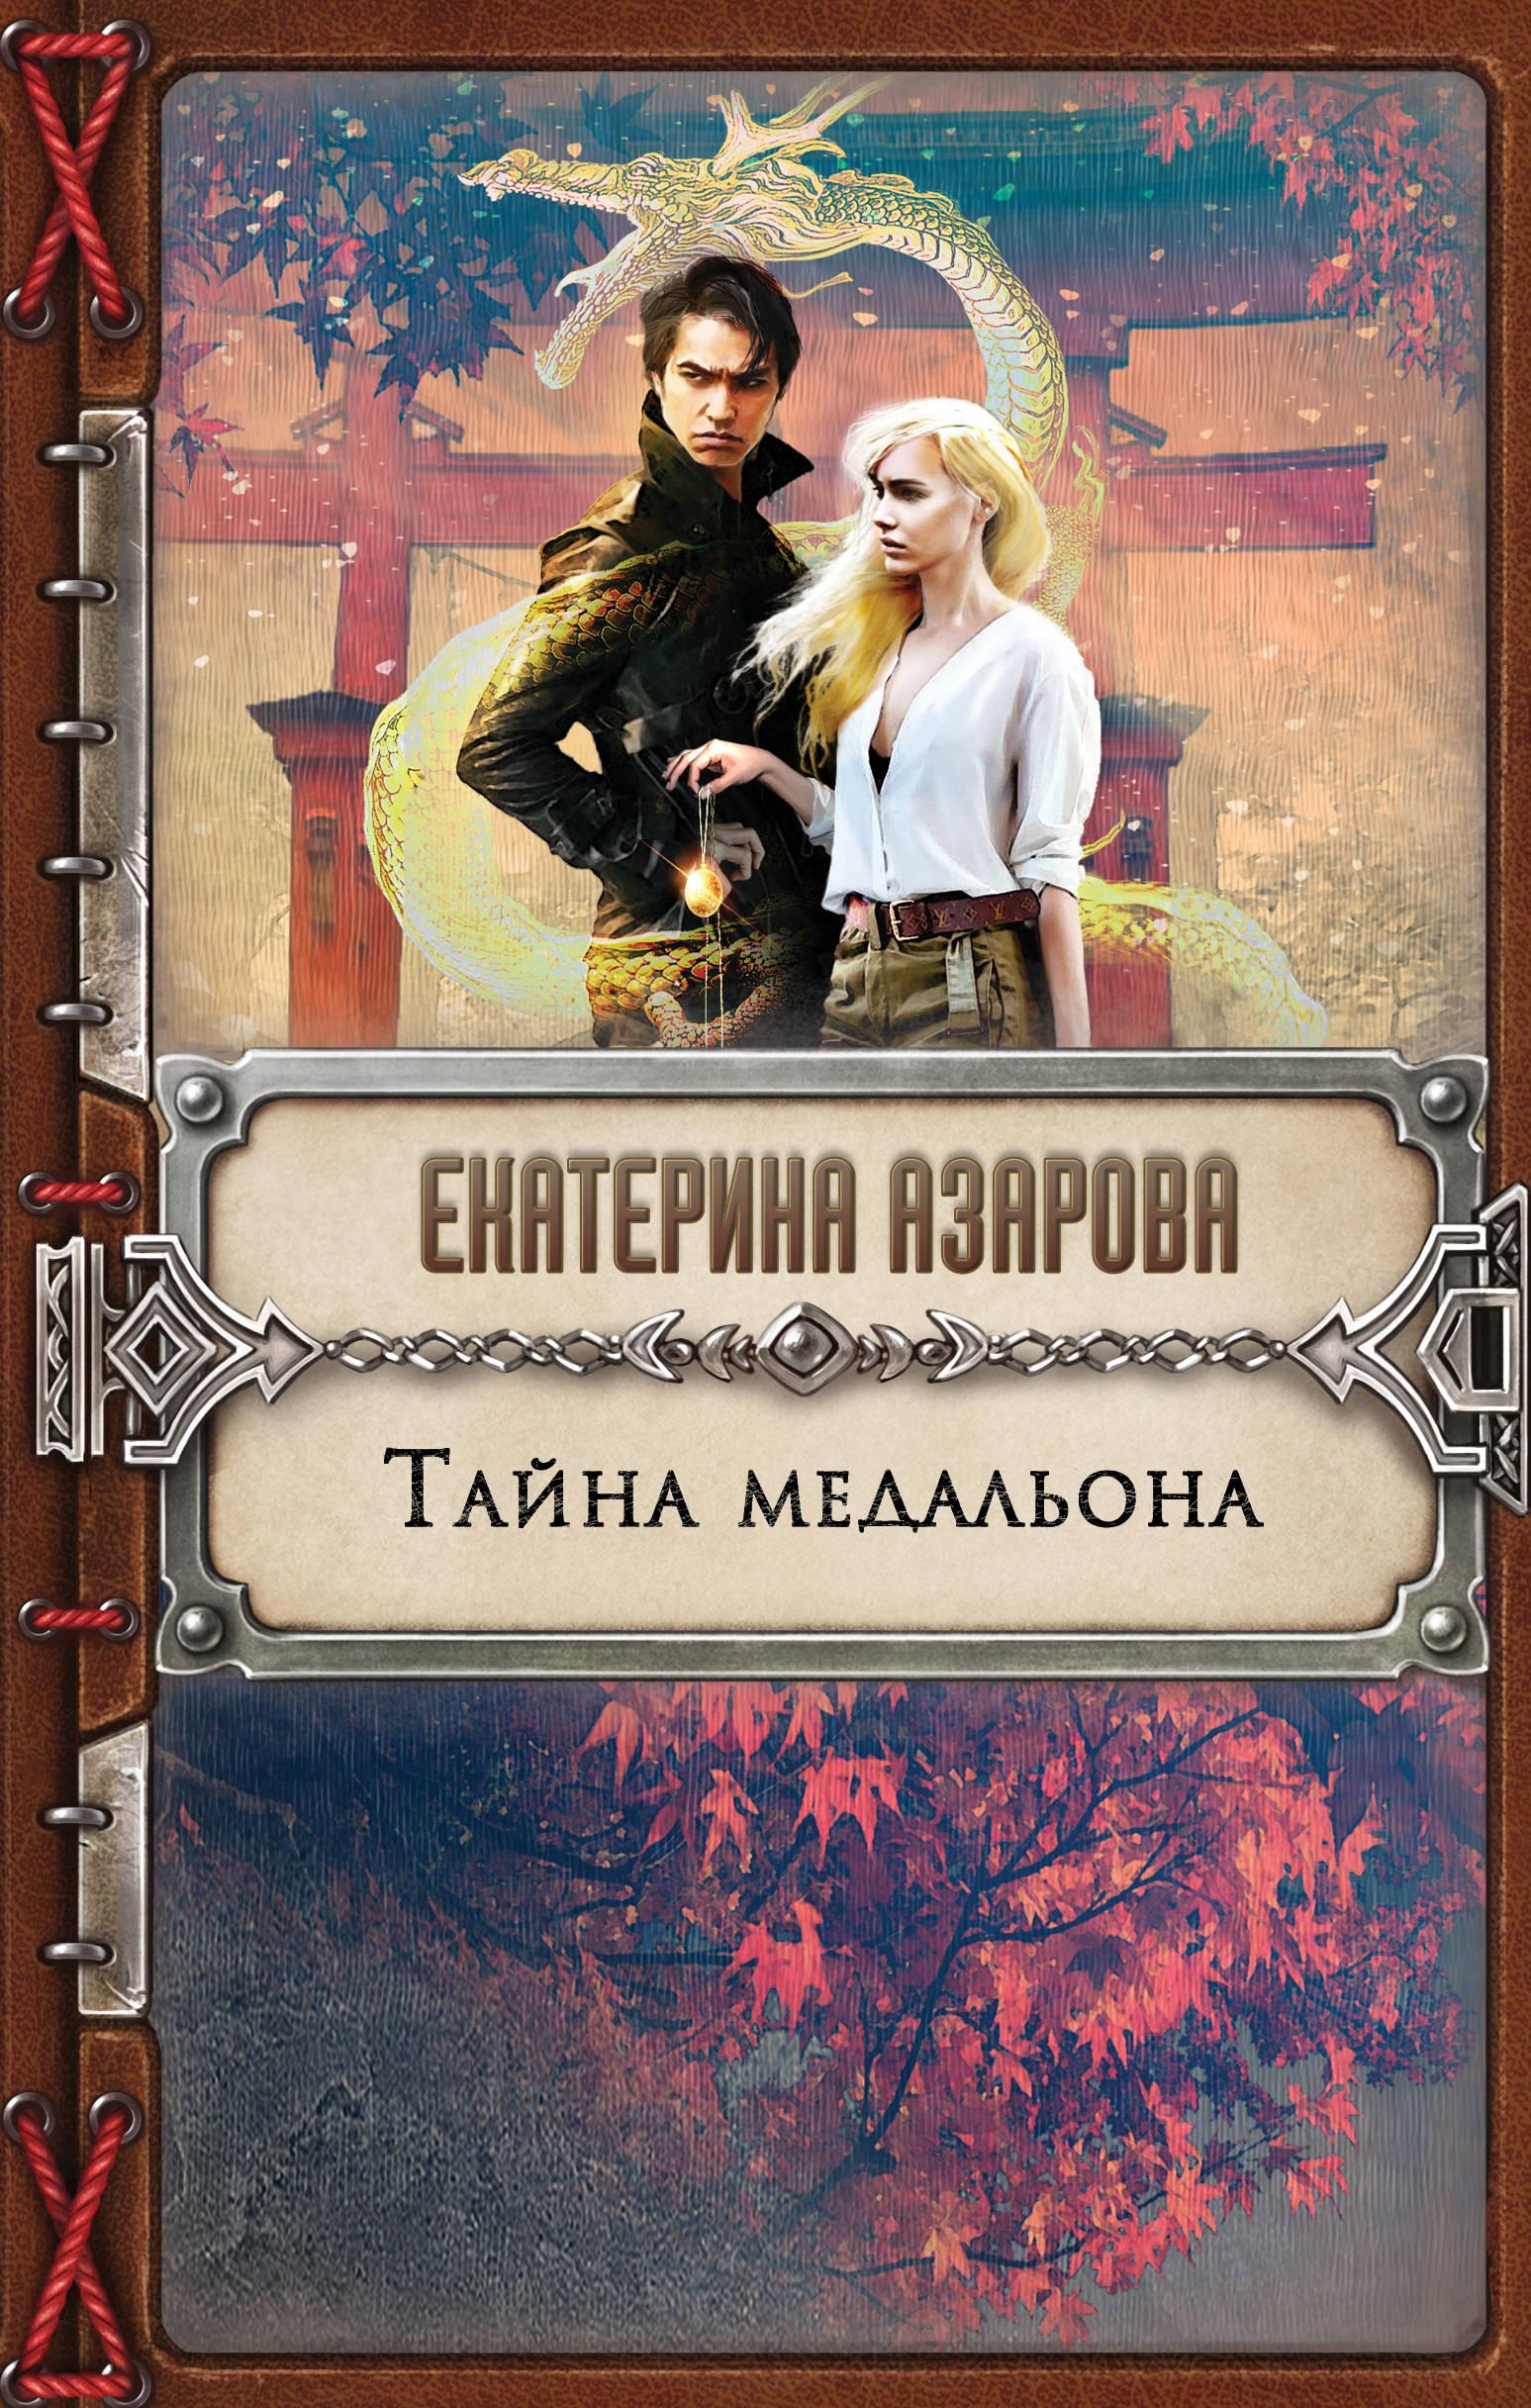 Zakazat.ru: Тайна медальона. Екатерина Азарова